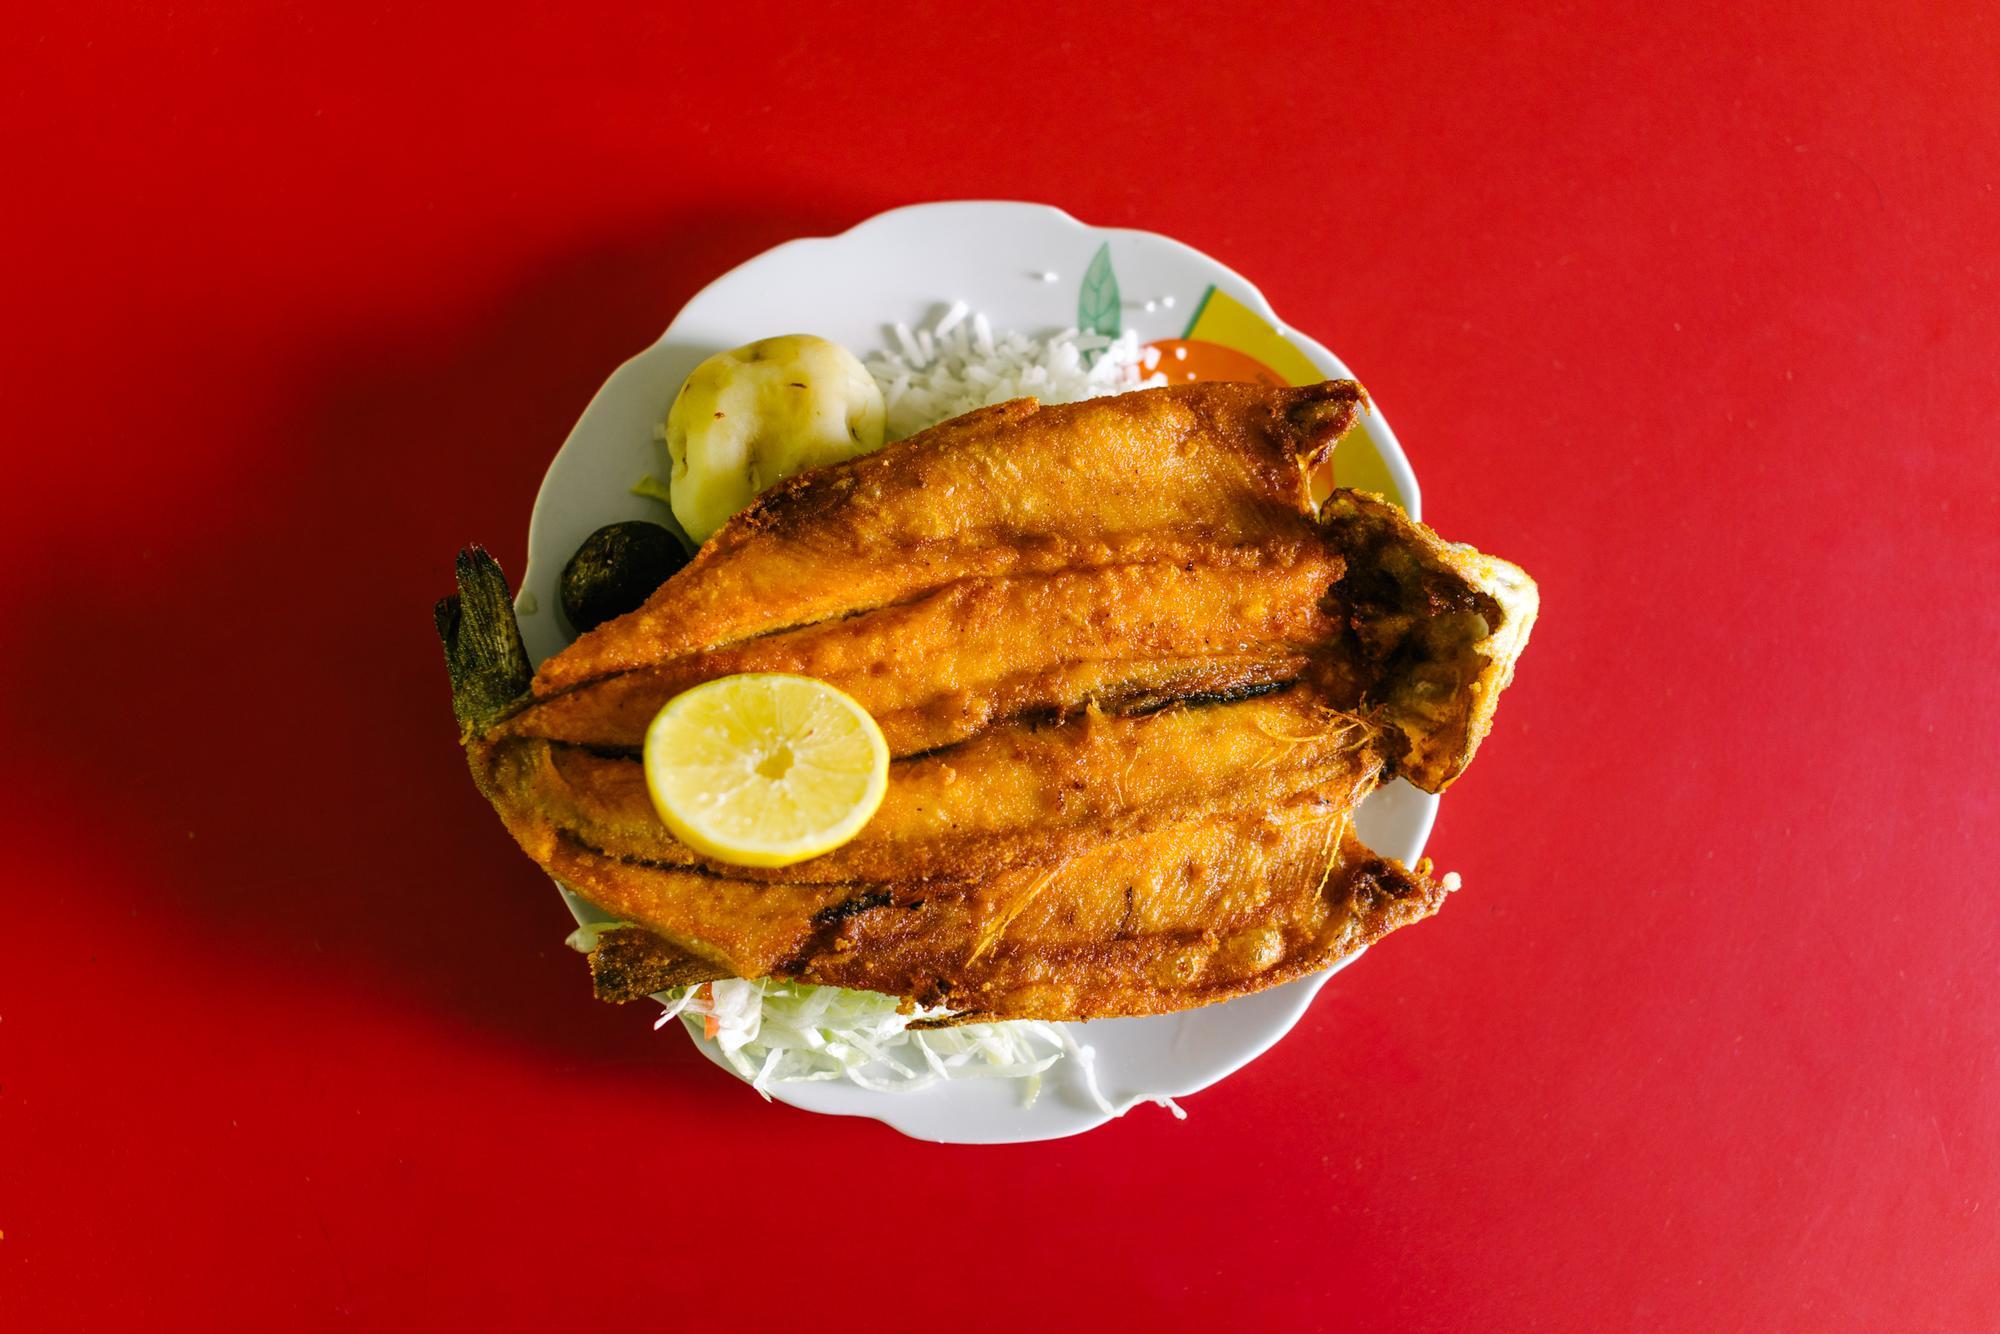 Trucha... An Andean staple